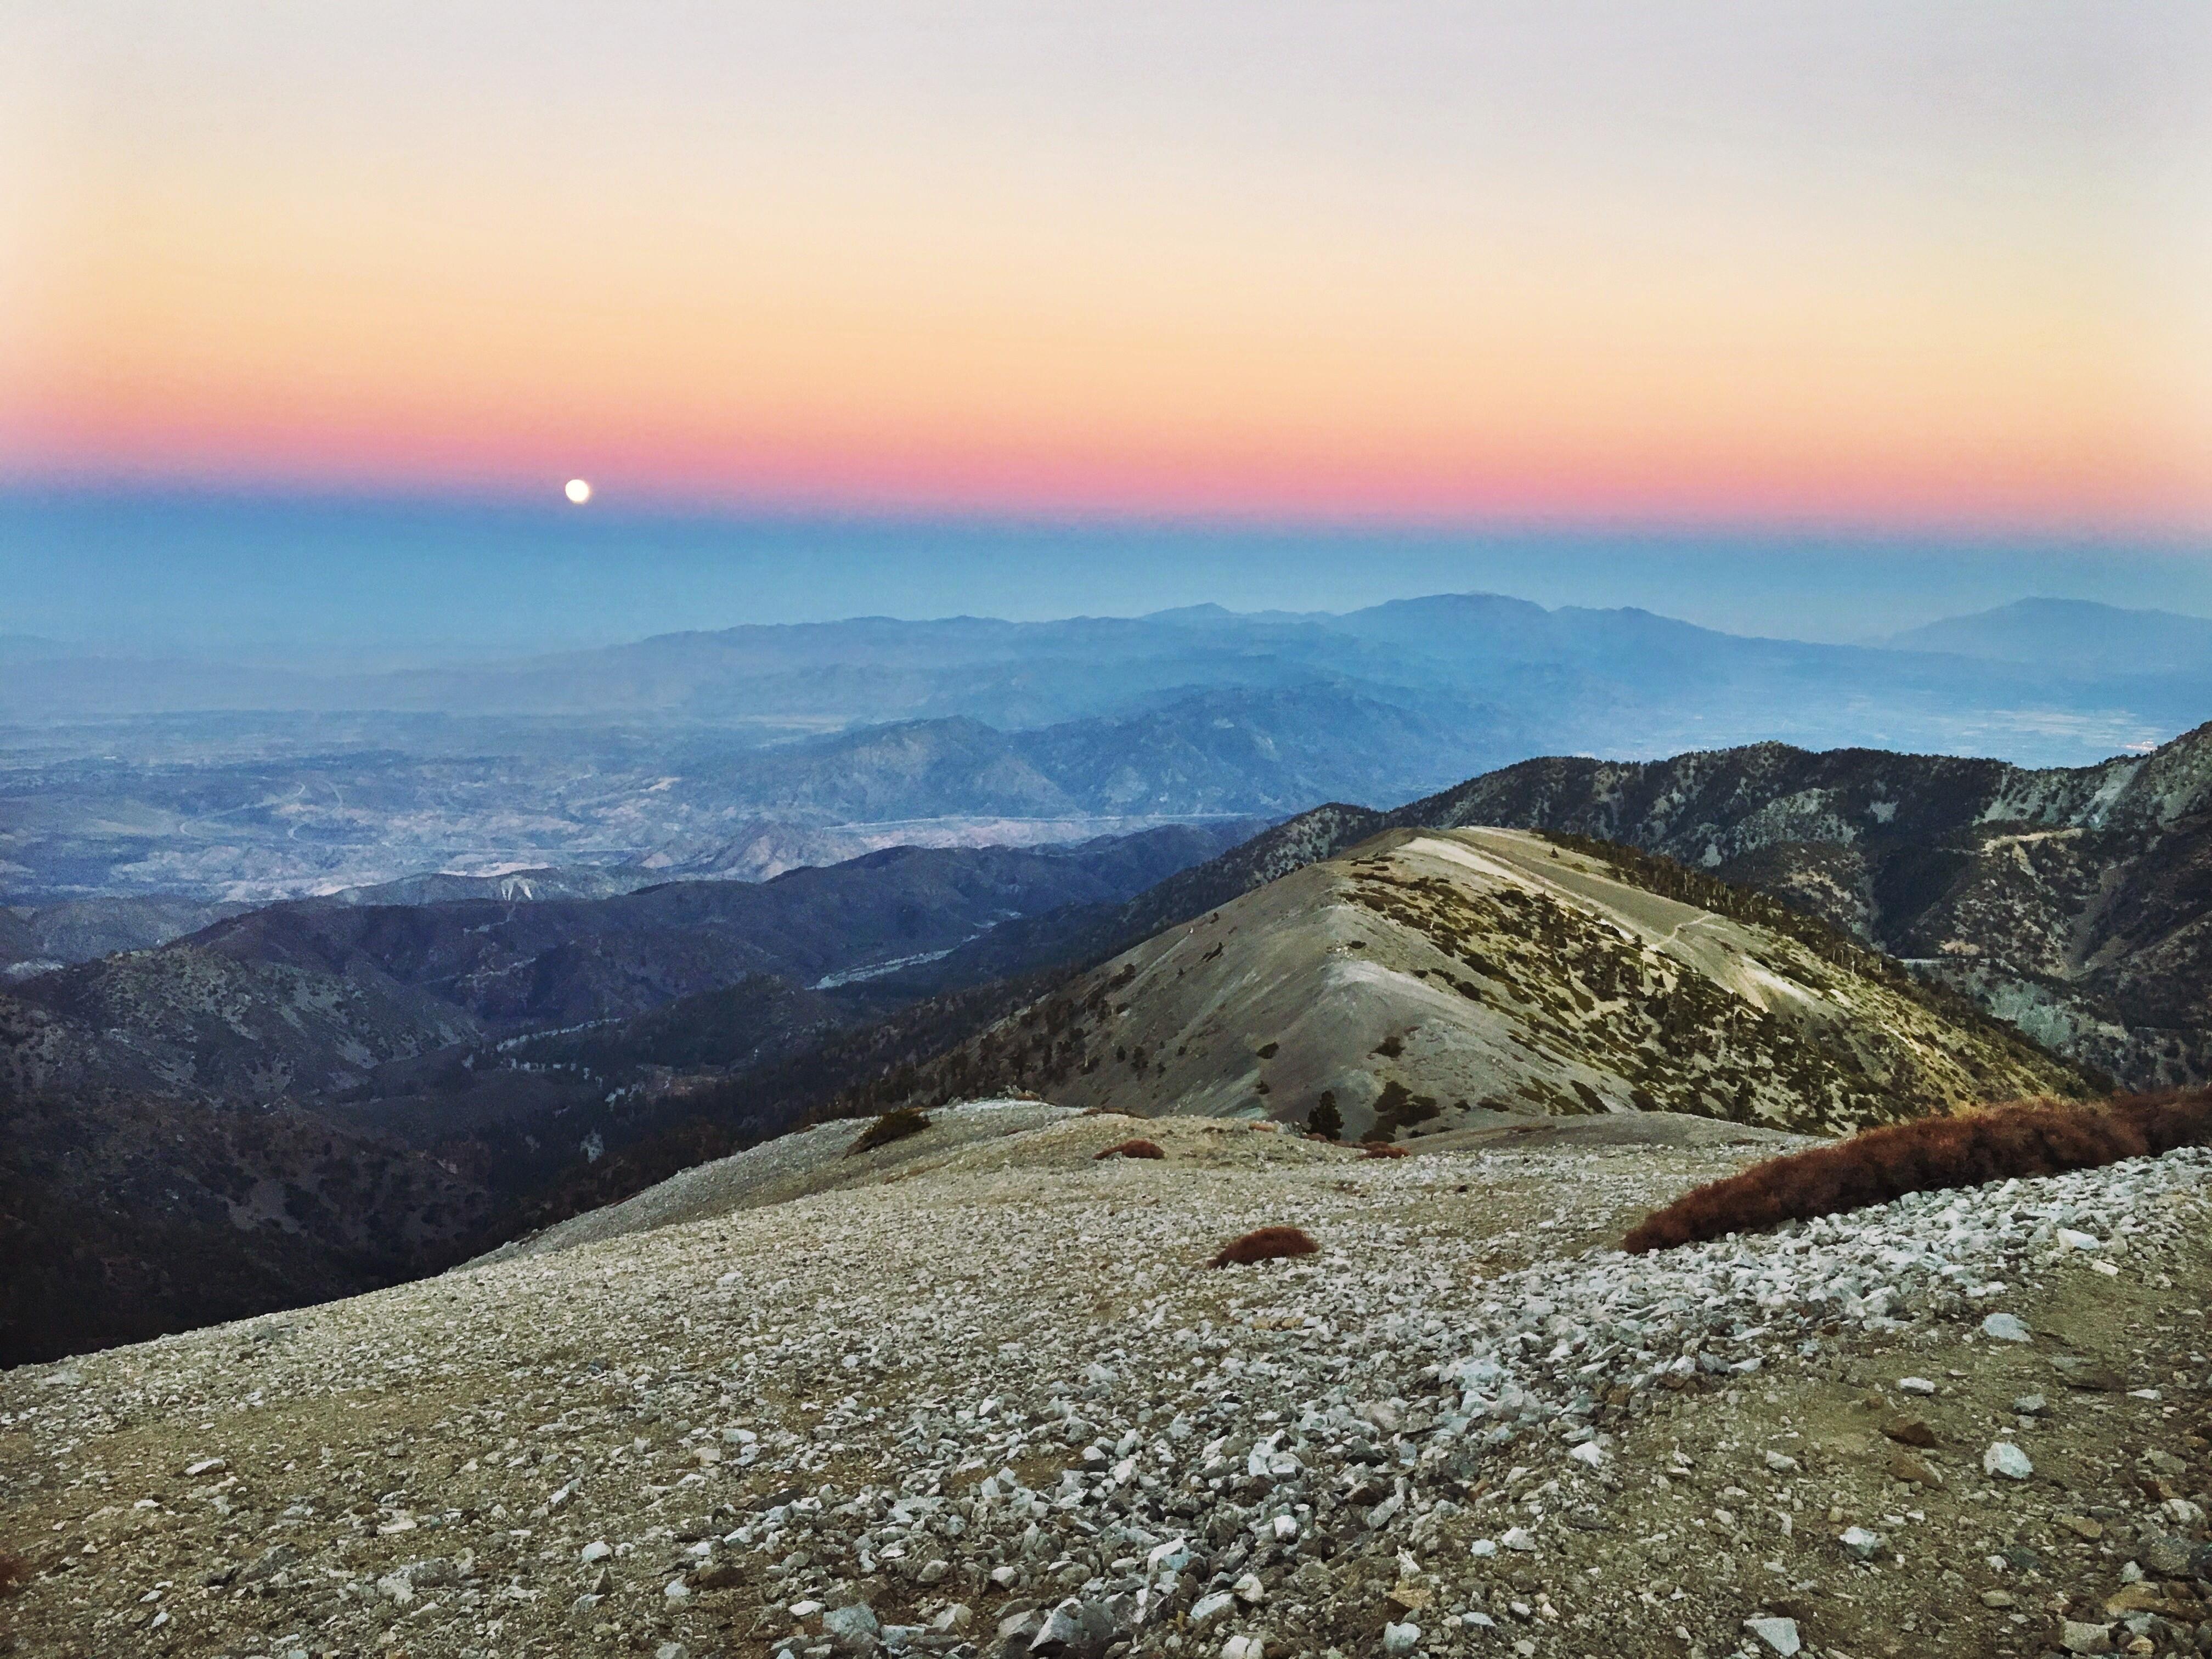 Mount Baldy Super Moon